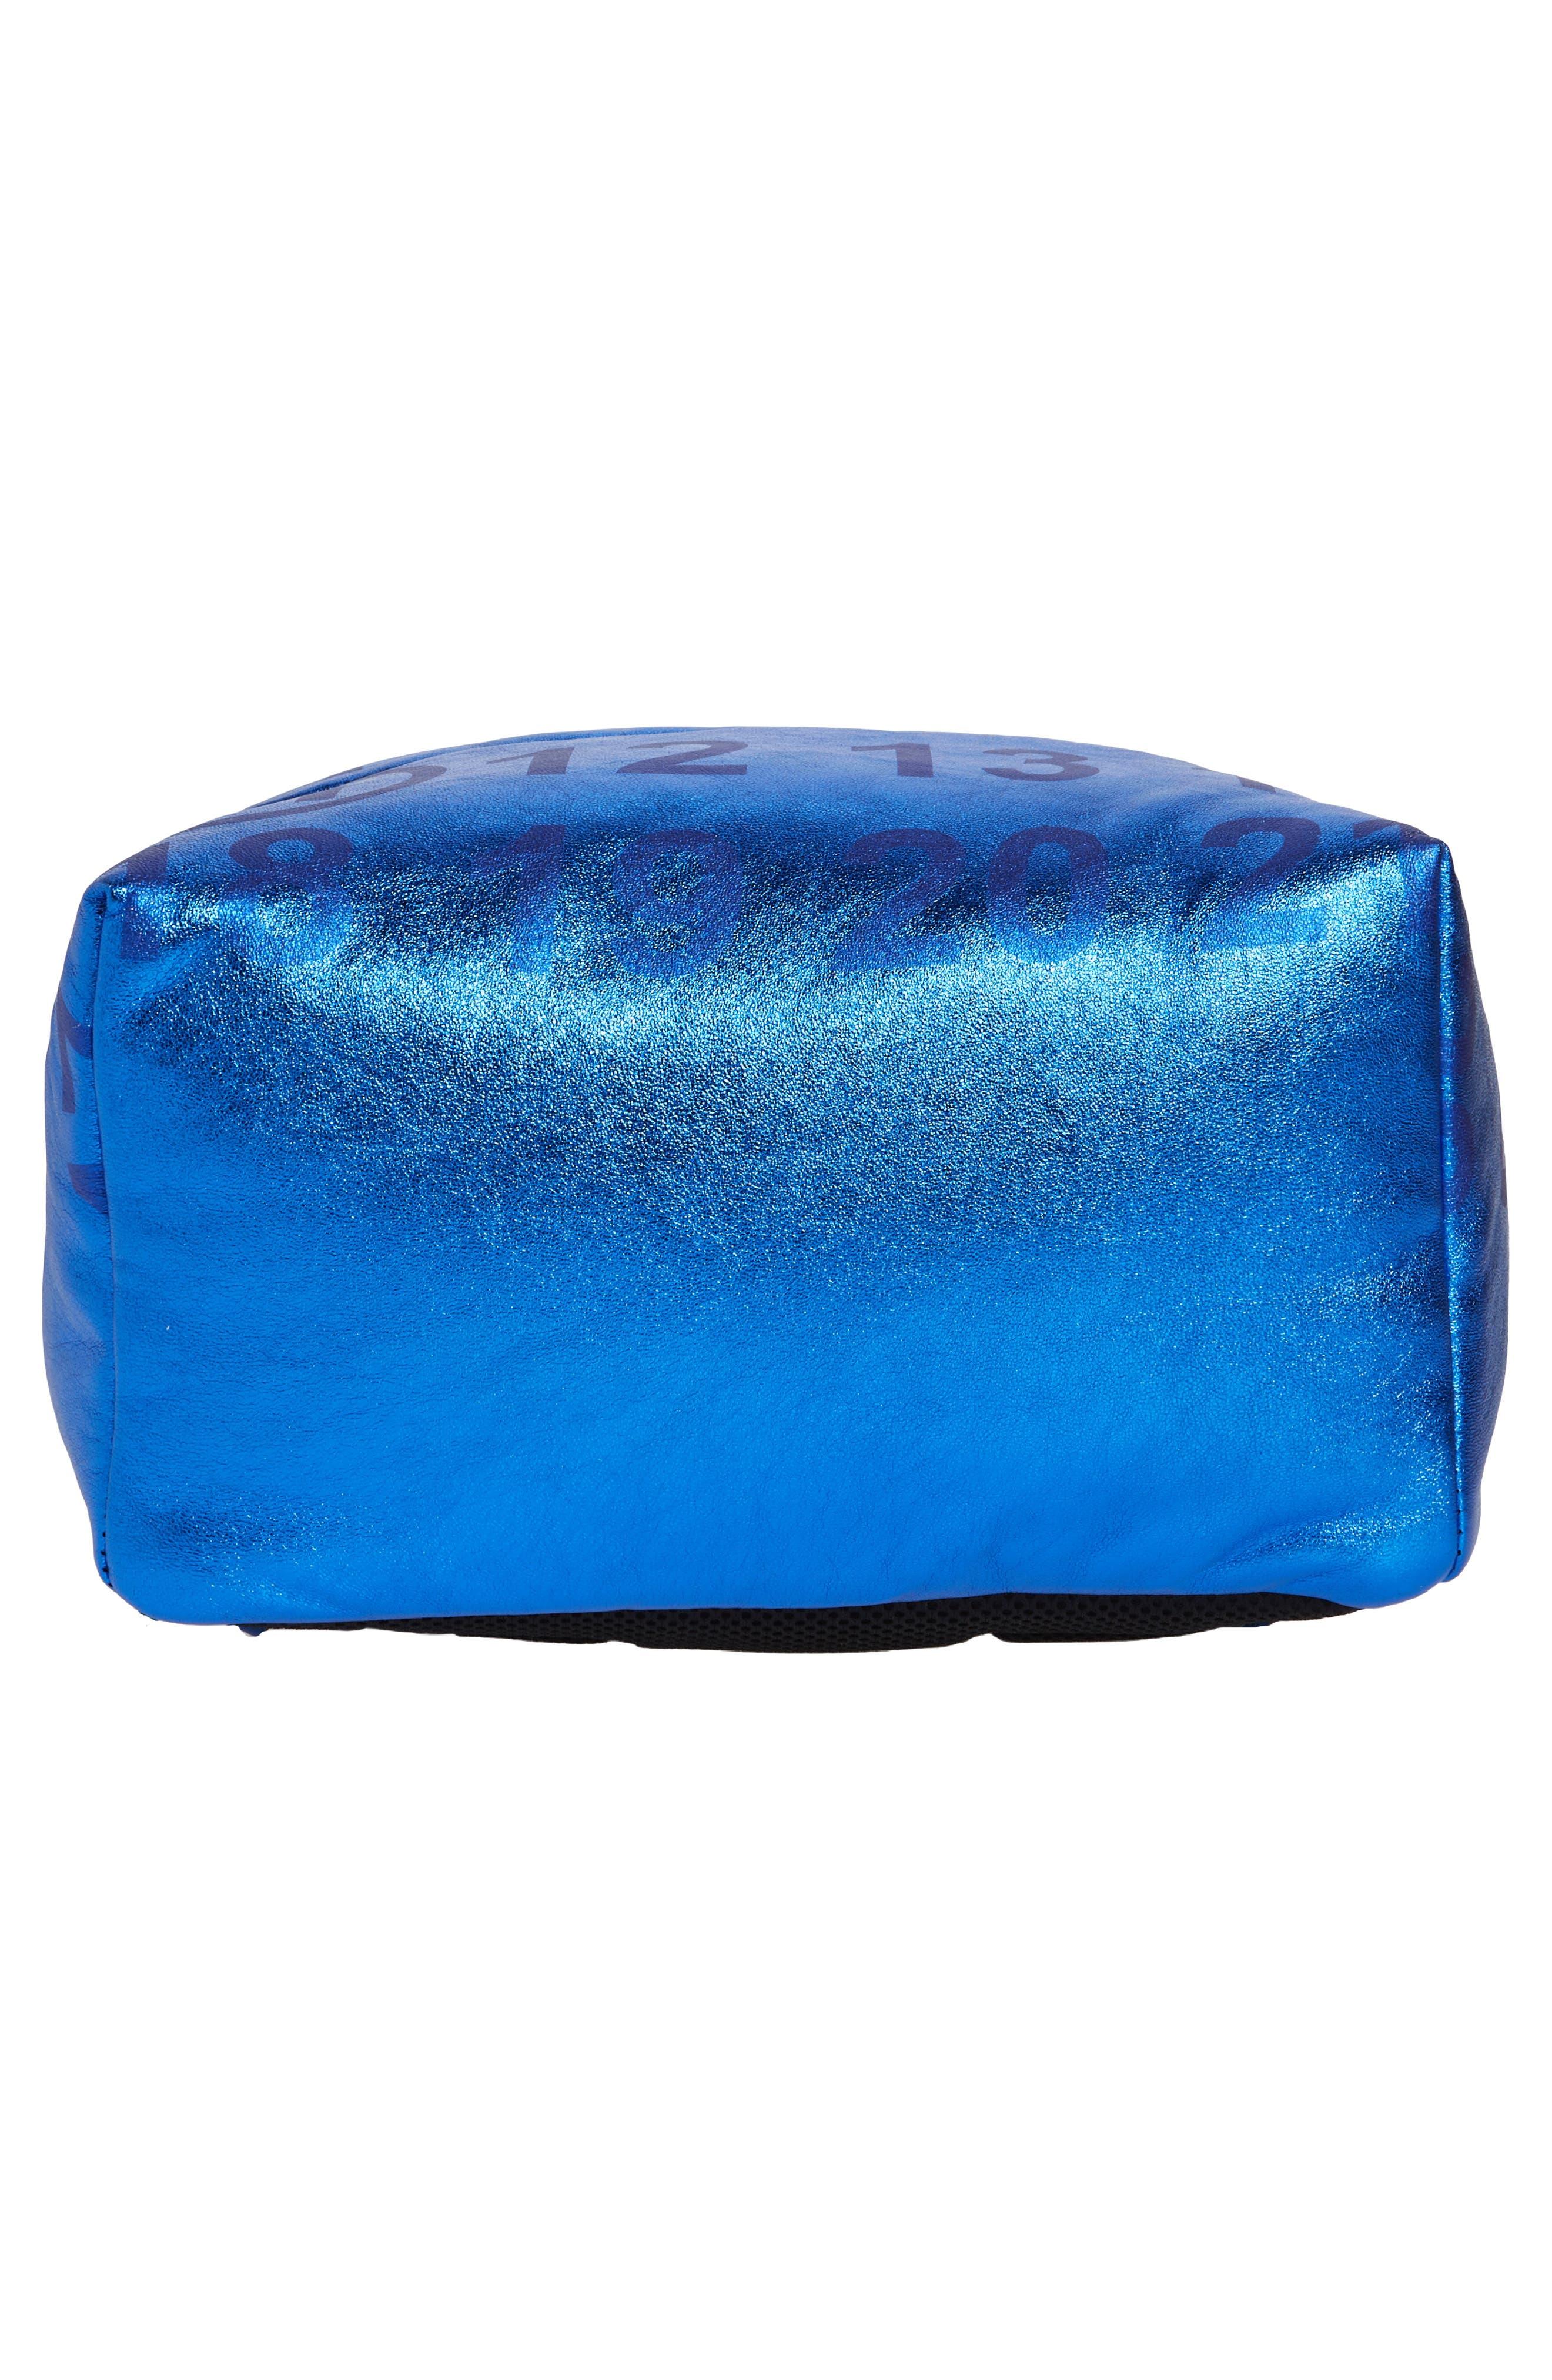 MAISON MARGIELA,                             Medium Number Print Backpack,                             Alternate thumbnail 6, color,                             DAZZLING BLUE